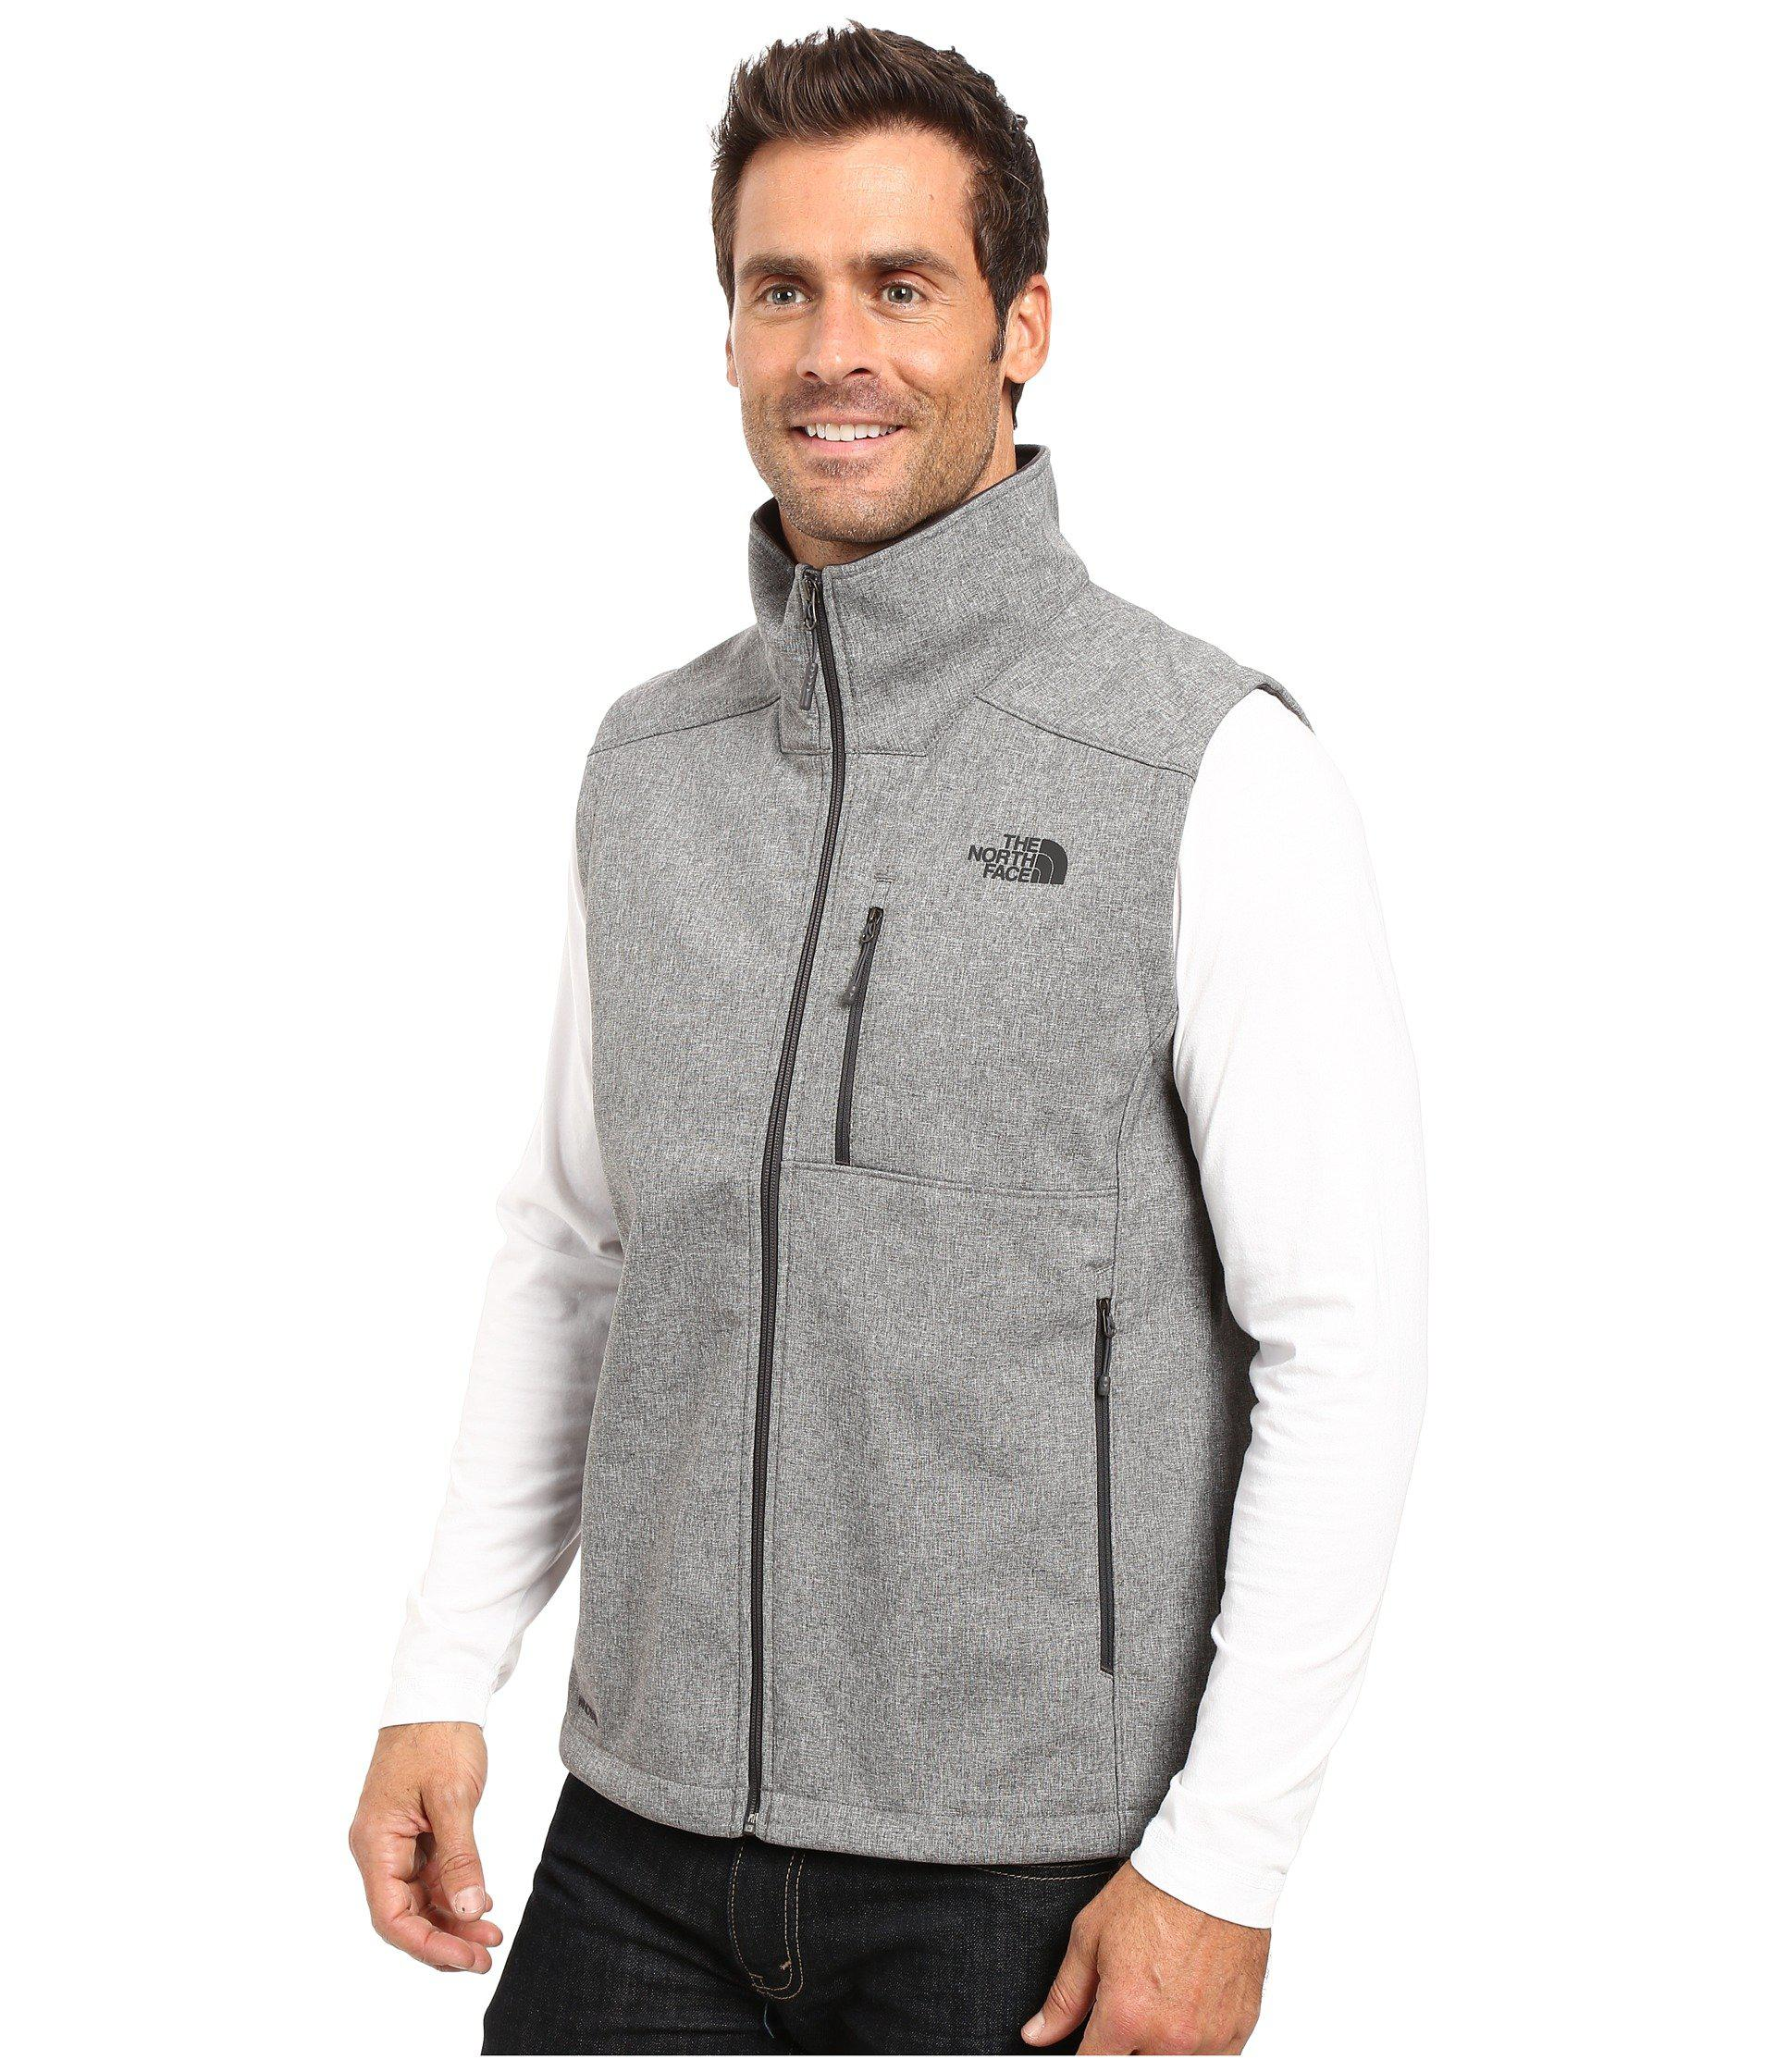 be035ca0a2a Lyst - The North Face Apex Bionic 2 Vest (tnf Black) Men s Vest in Gray for  Men